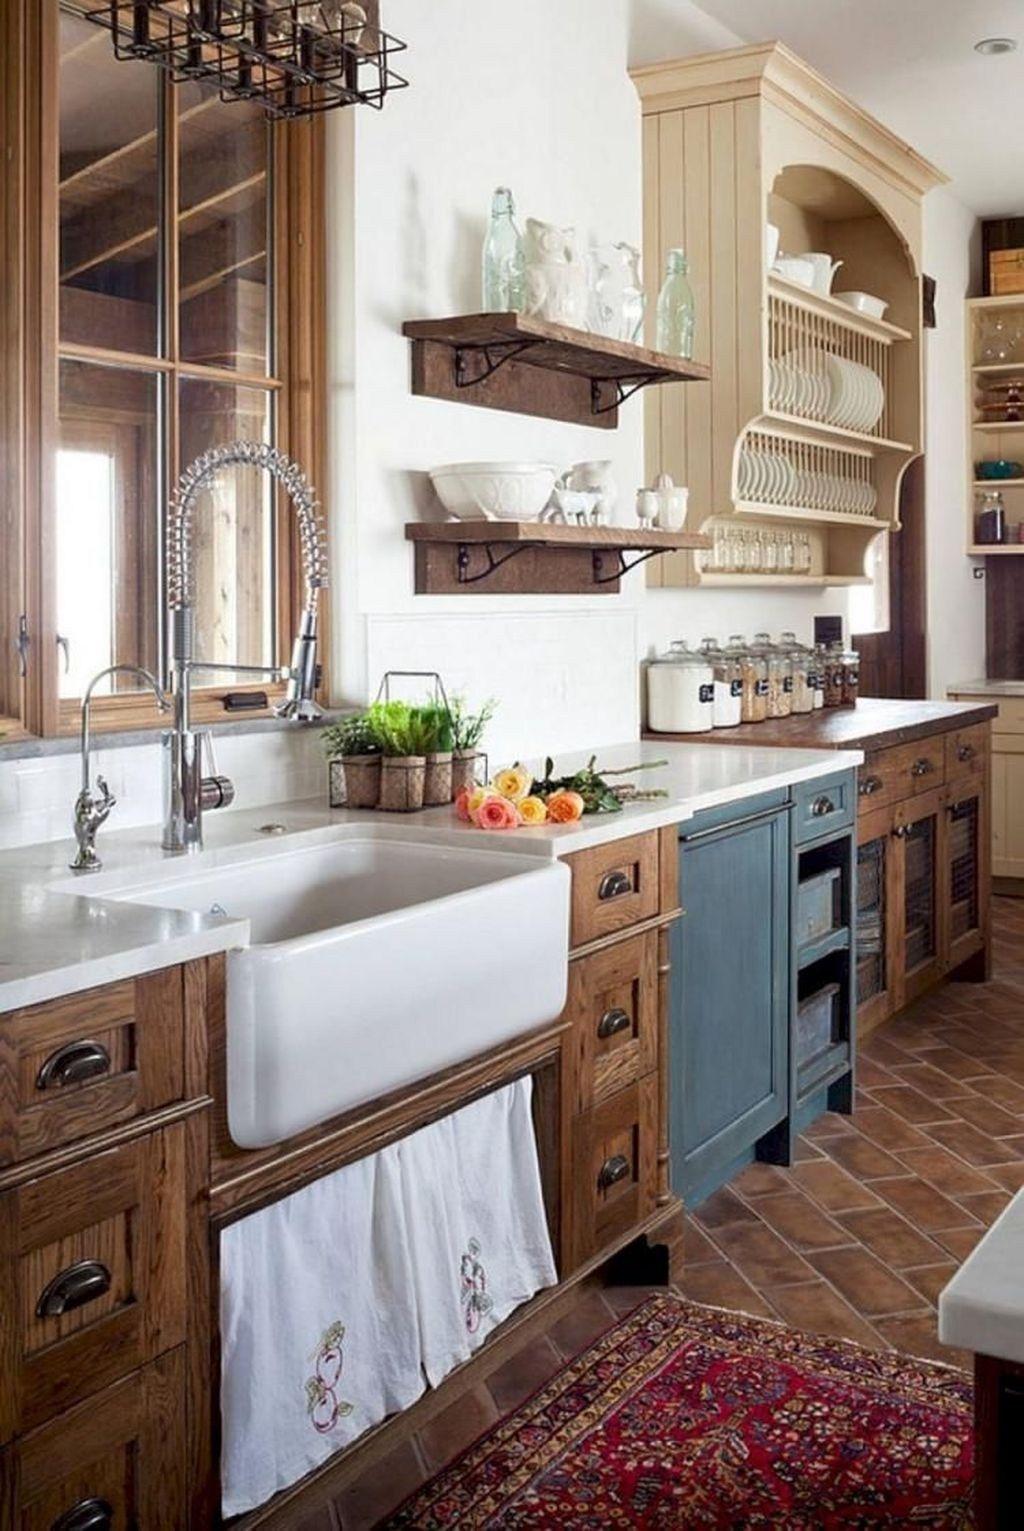 Stunning Rustic Farmhouse Kitchen Cabinets Ideas 09 Farmhouse